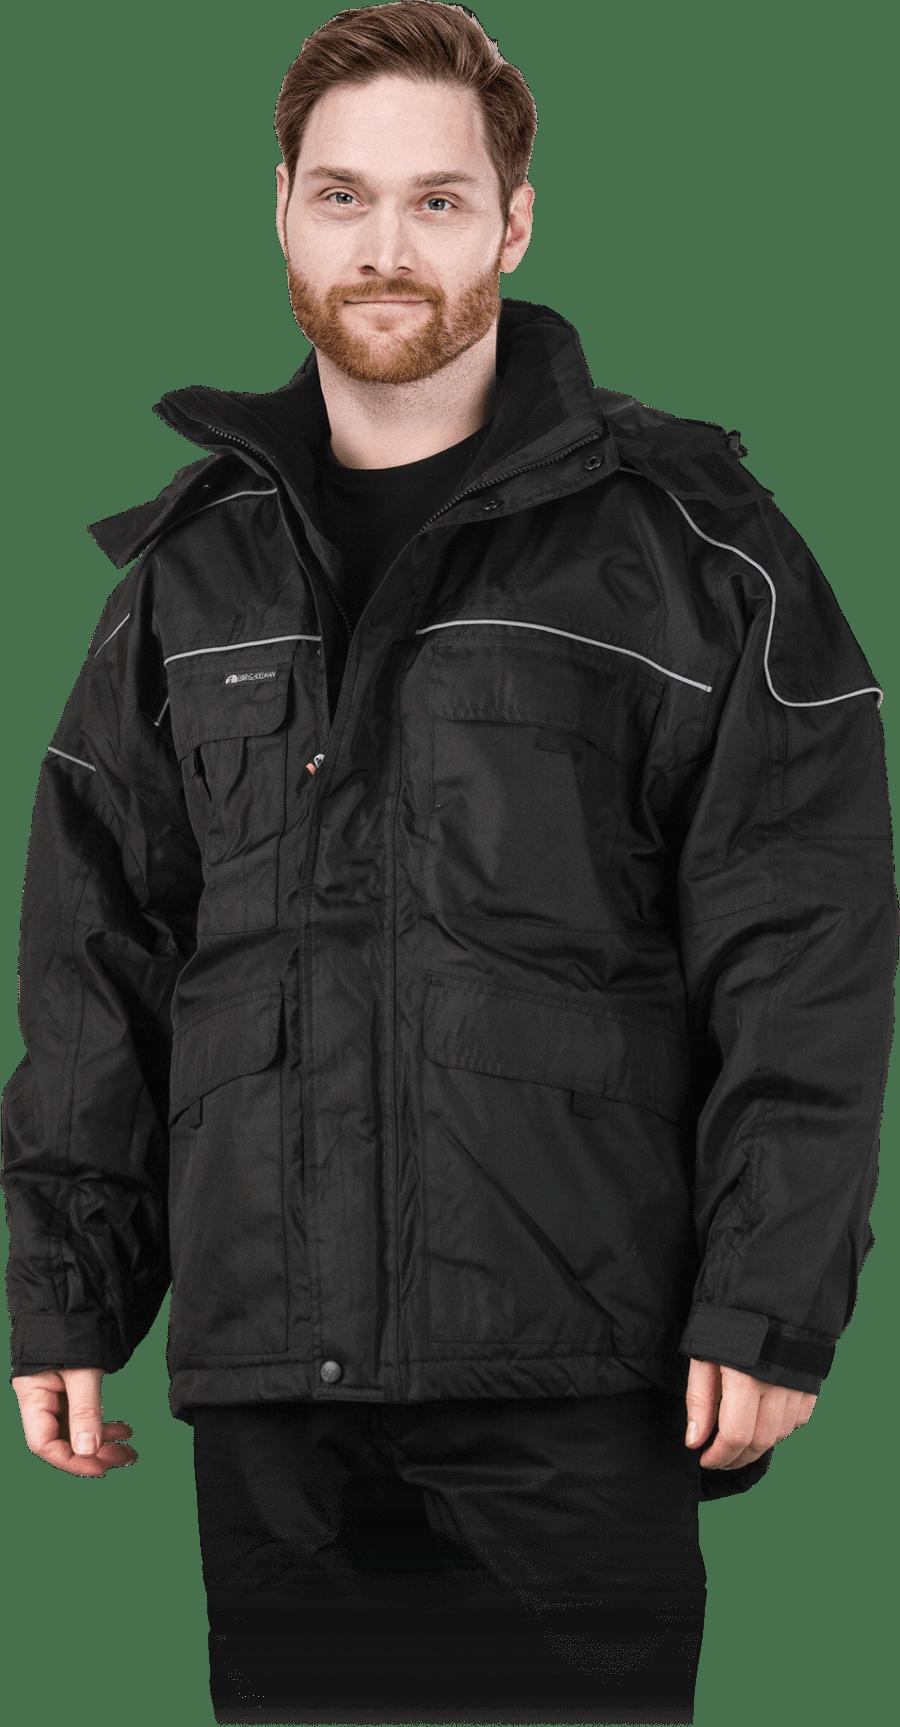 pracovna bunda zimna